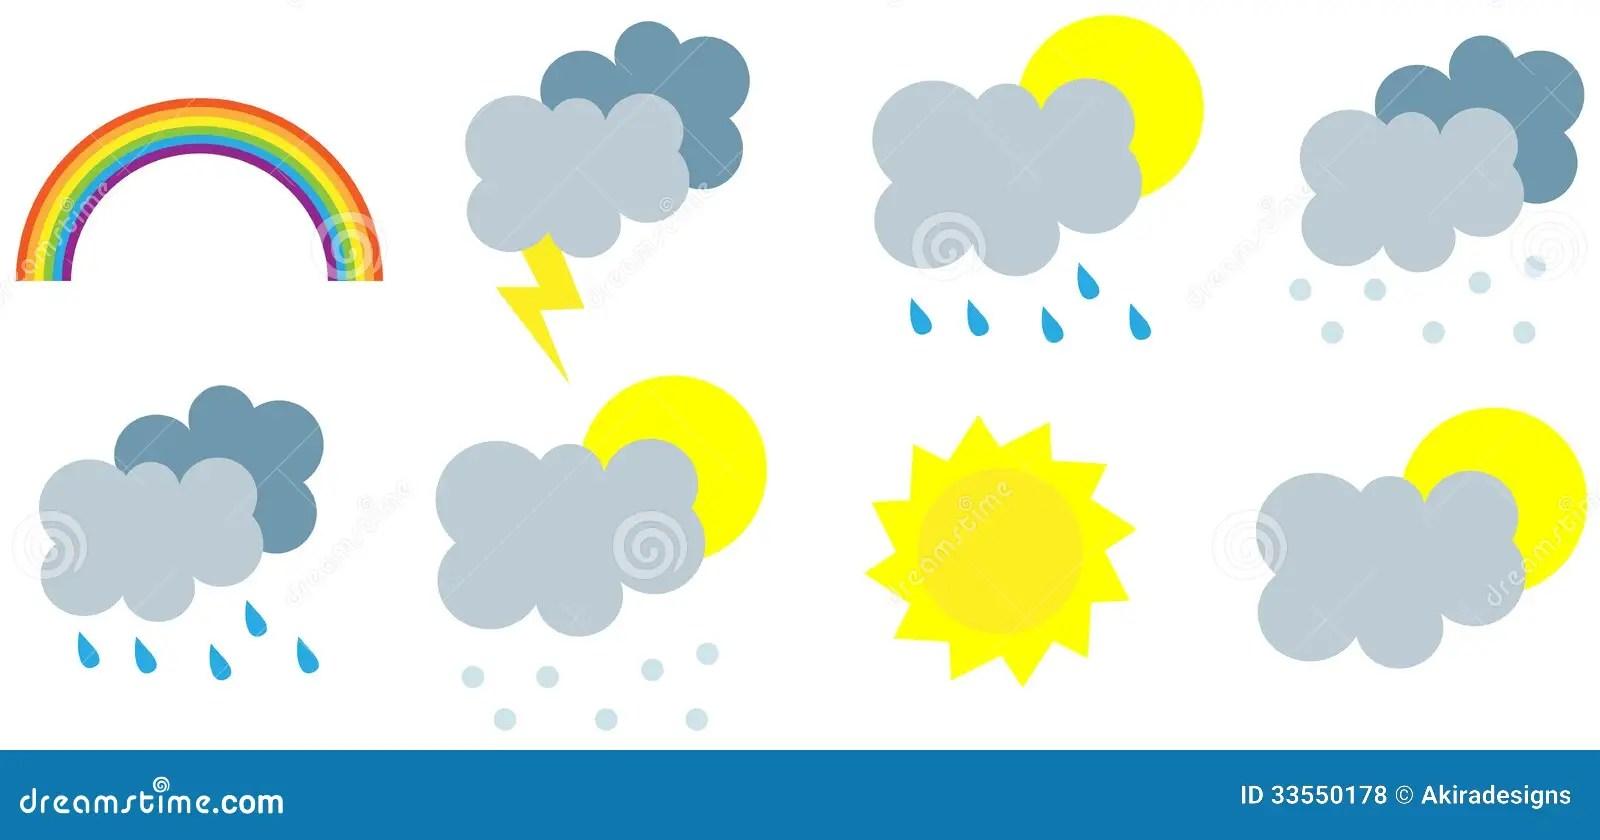 hight resolution of wather seasons forecast symbols